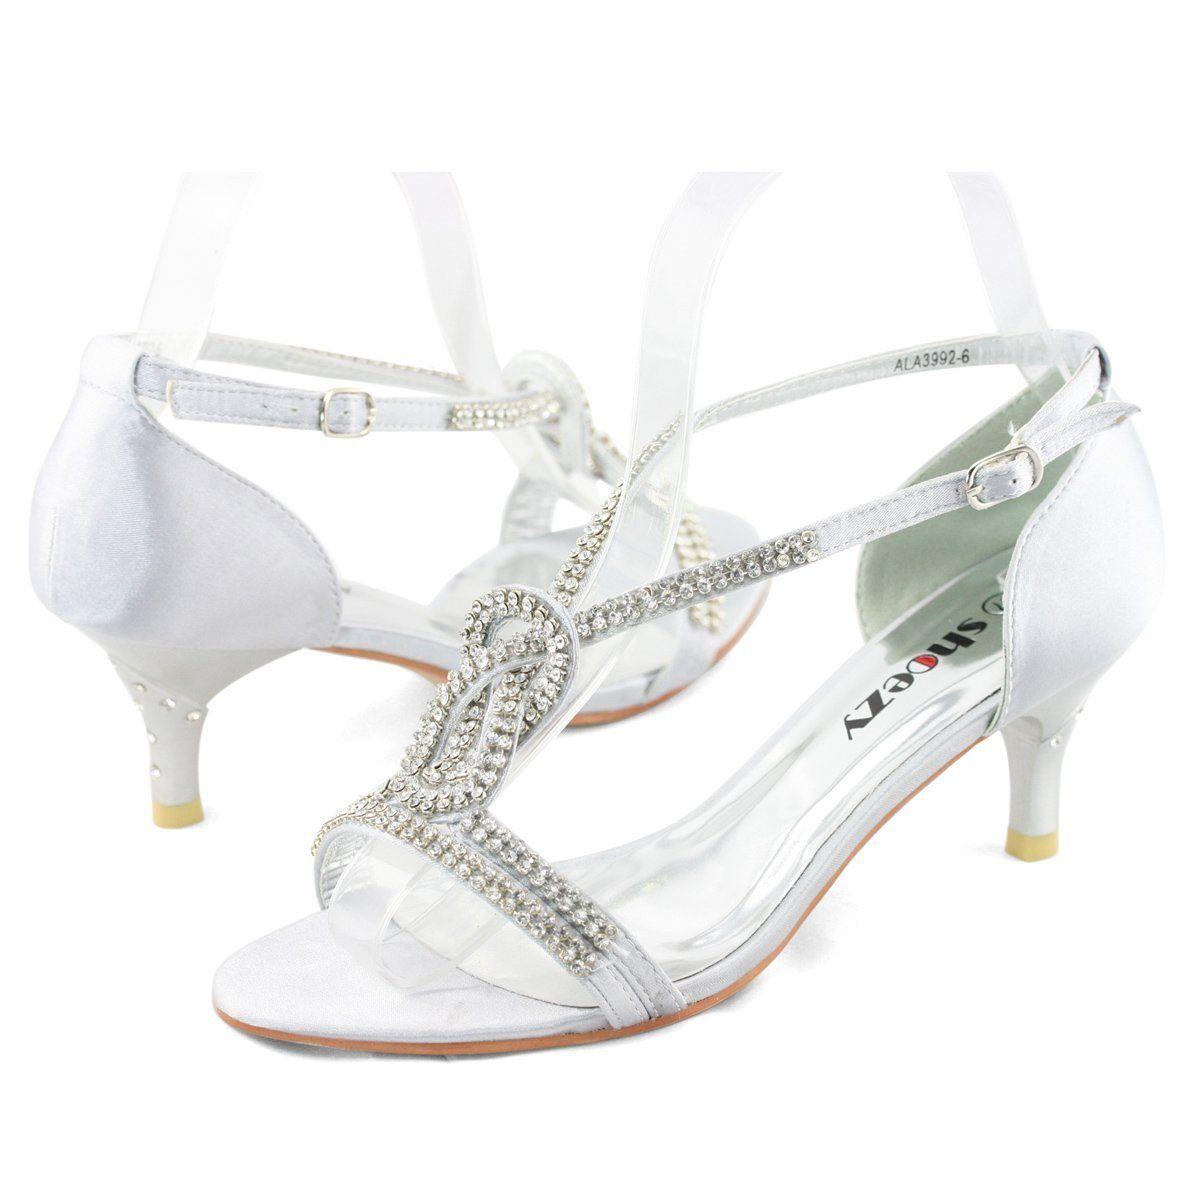 Amazon.com: Shoezy Womens Silver Satin Wedding Cross Strappy ...